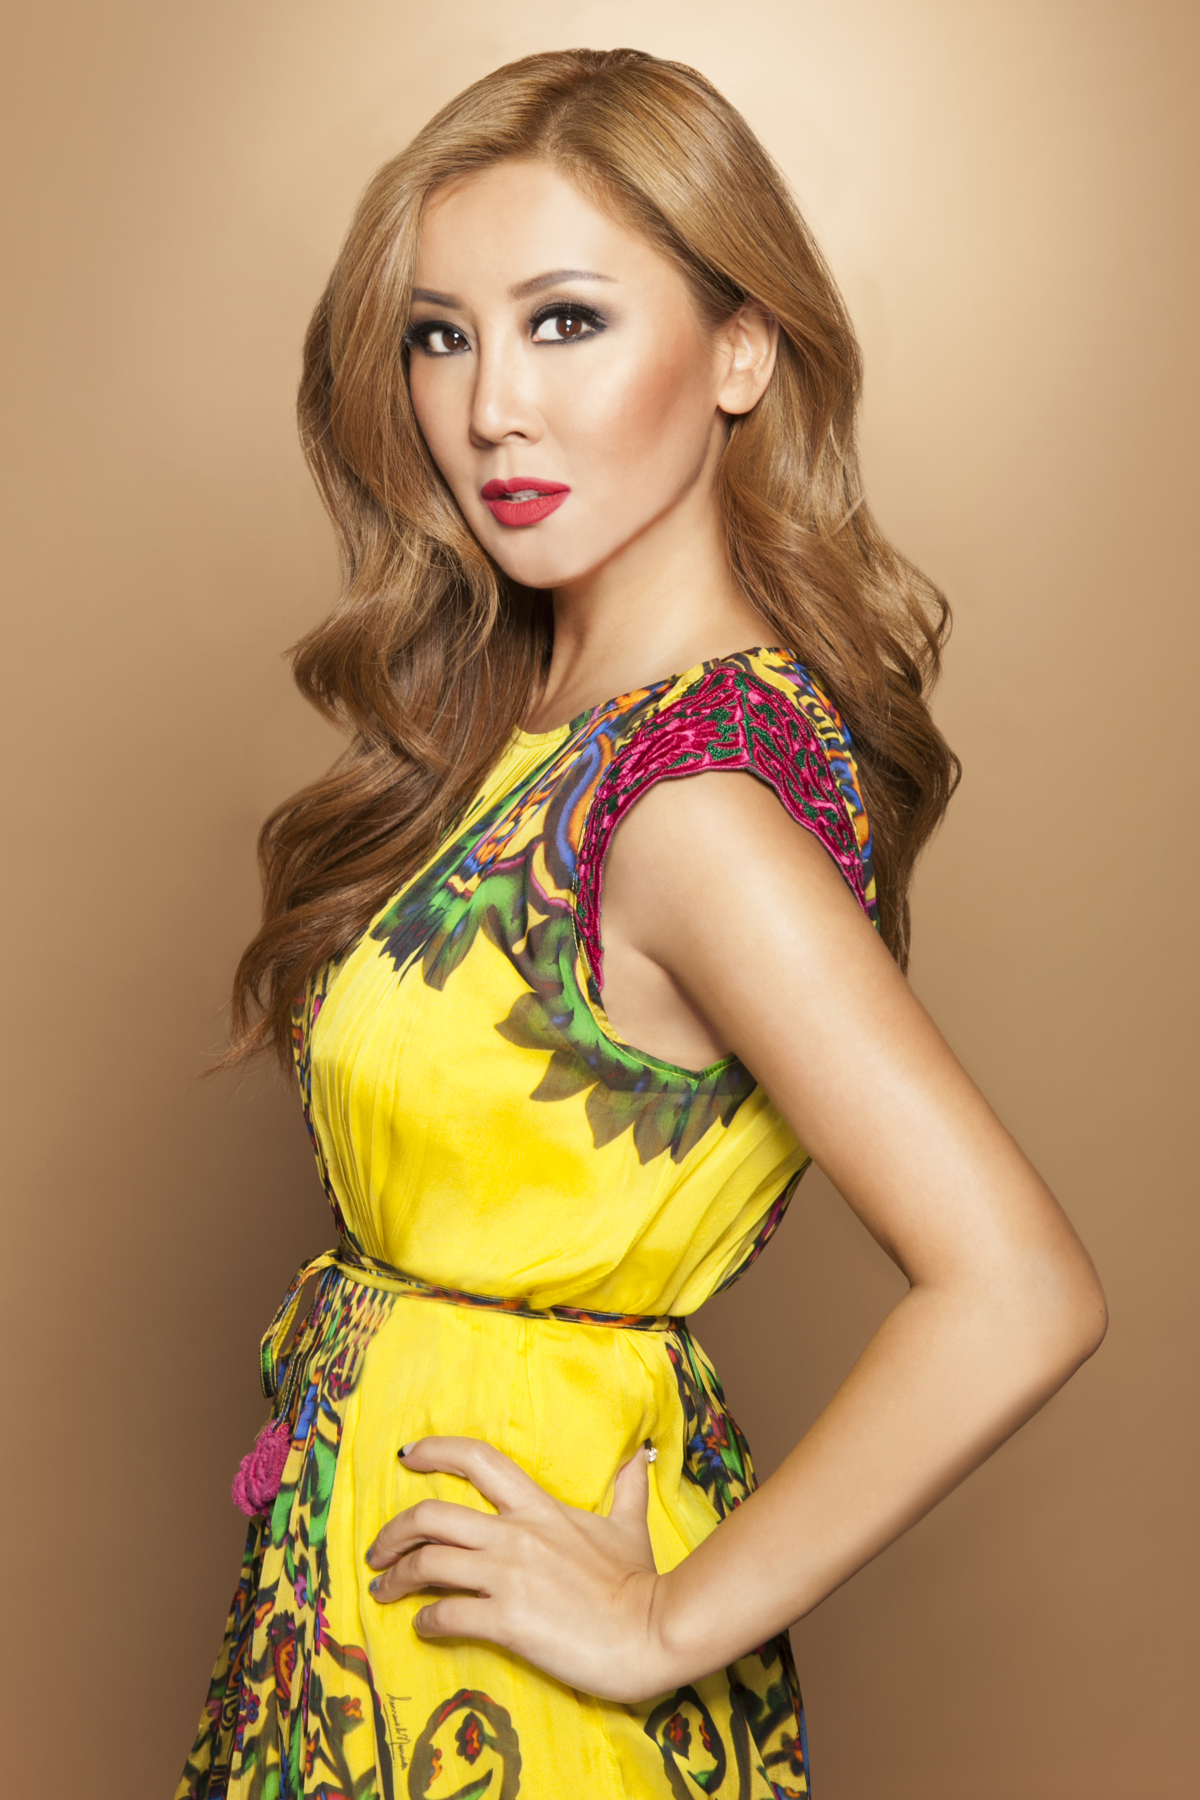 Five Rules For Life: NYX Cosmetics Founder Toni Ko